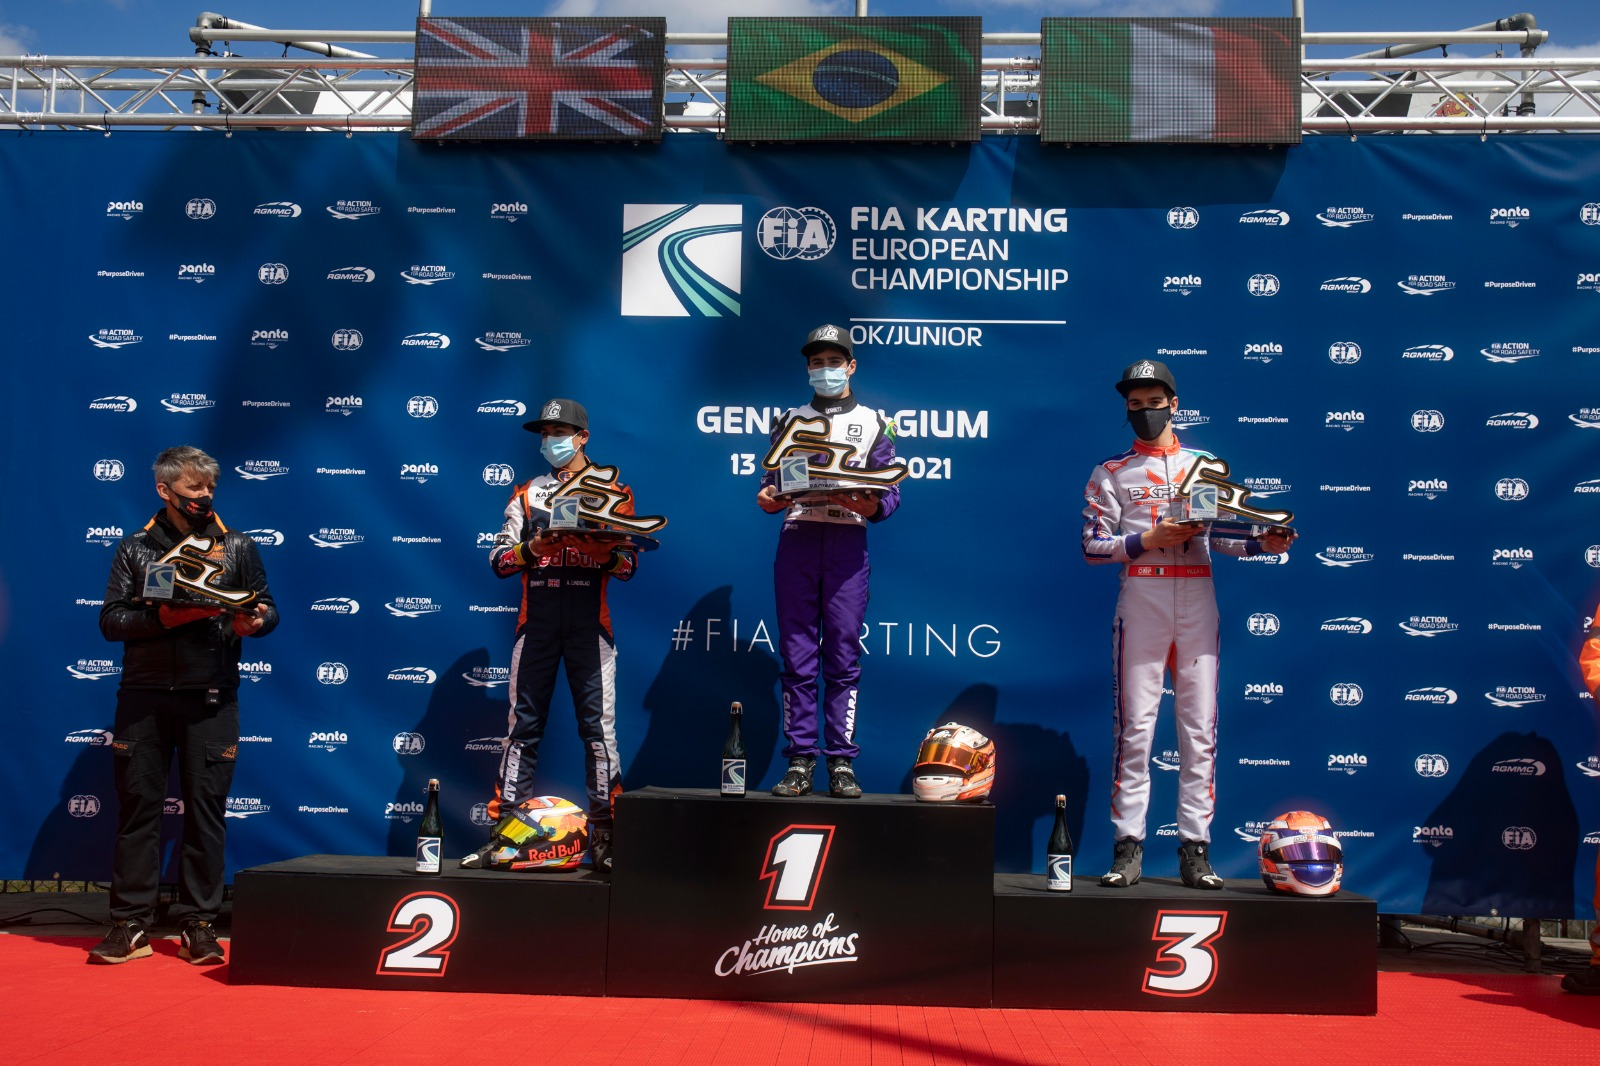 FIA Karting European Championship, Genk – Camara e Slater davanti a tutti